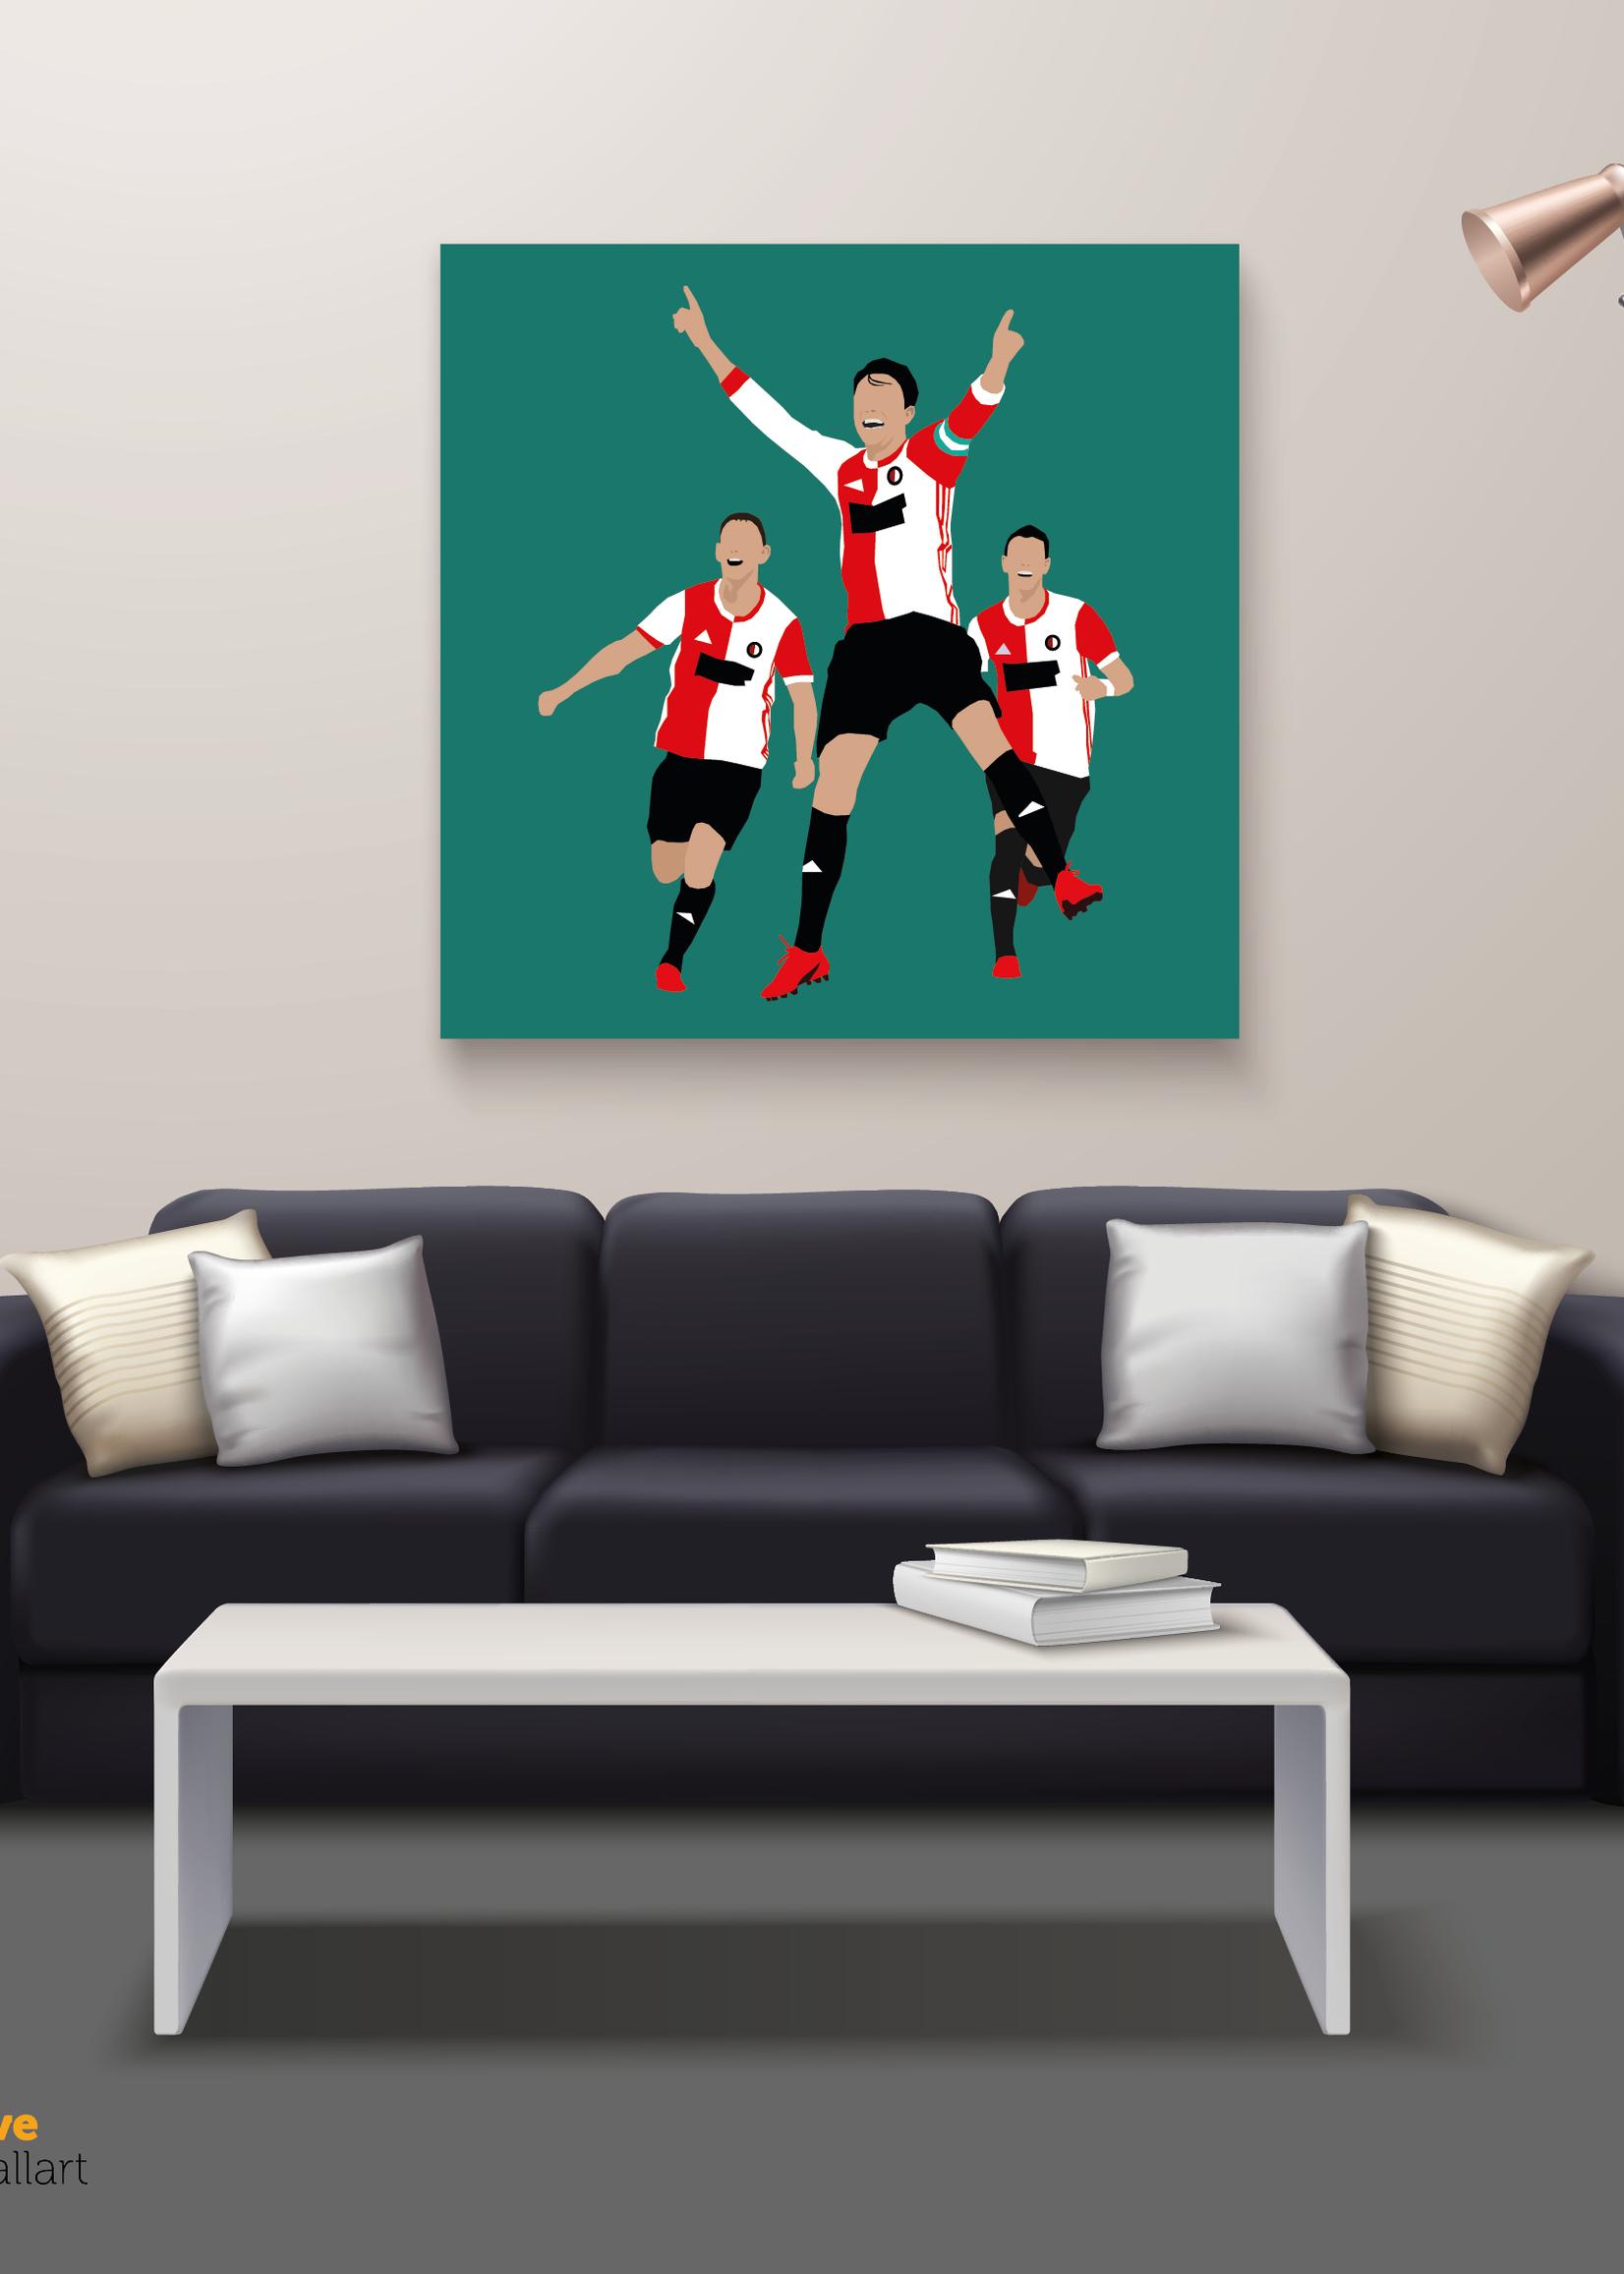 "We Love Football Art ""Hand in hand comrades"" We Love Football Art"